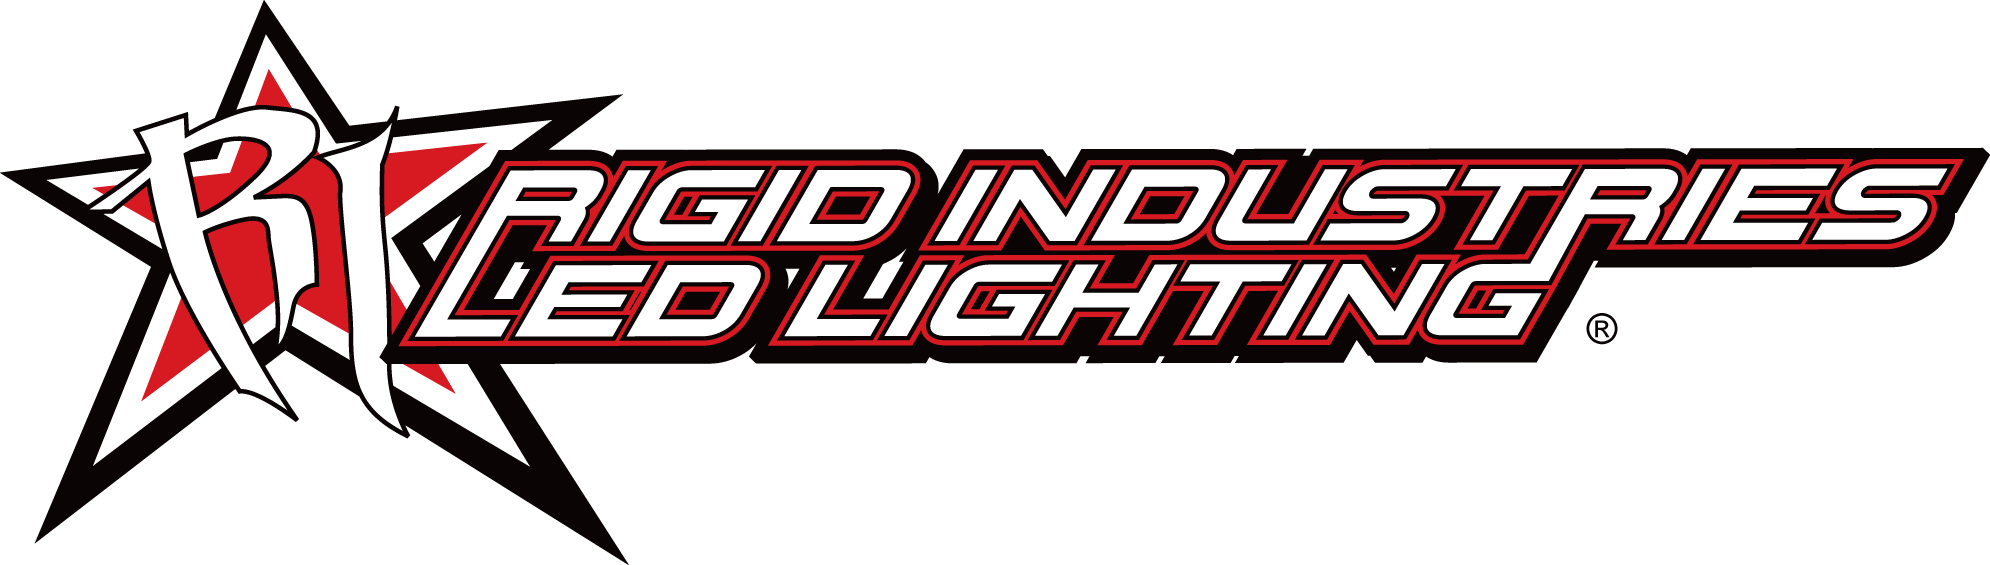 Rigid Industries Adds Avena, Short & Blaylock